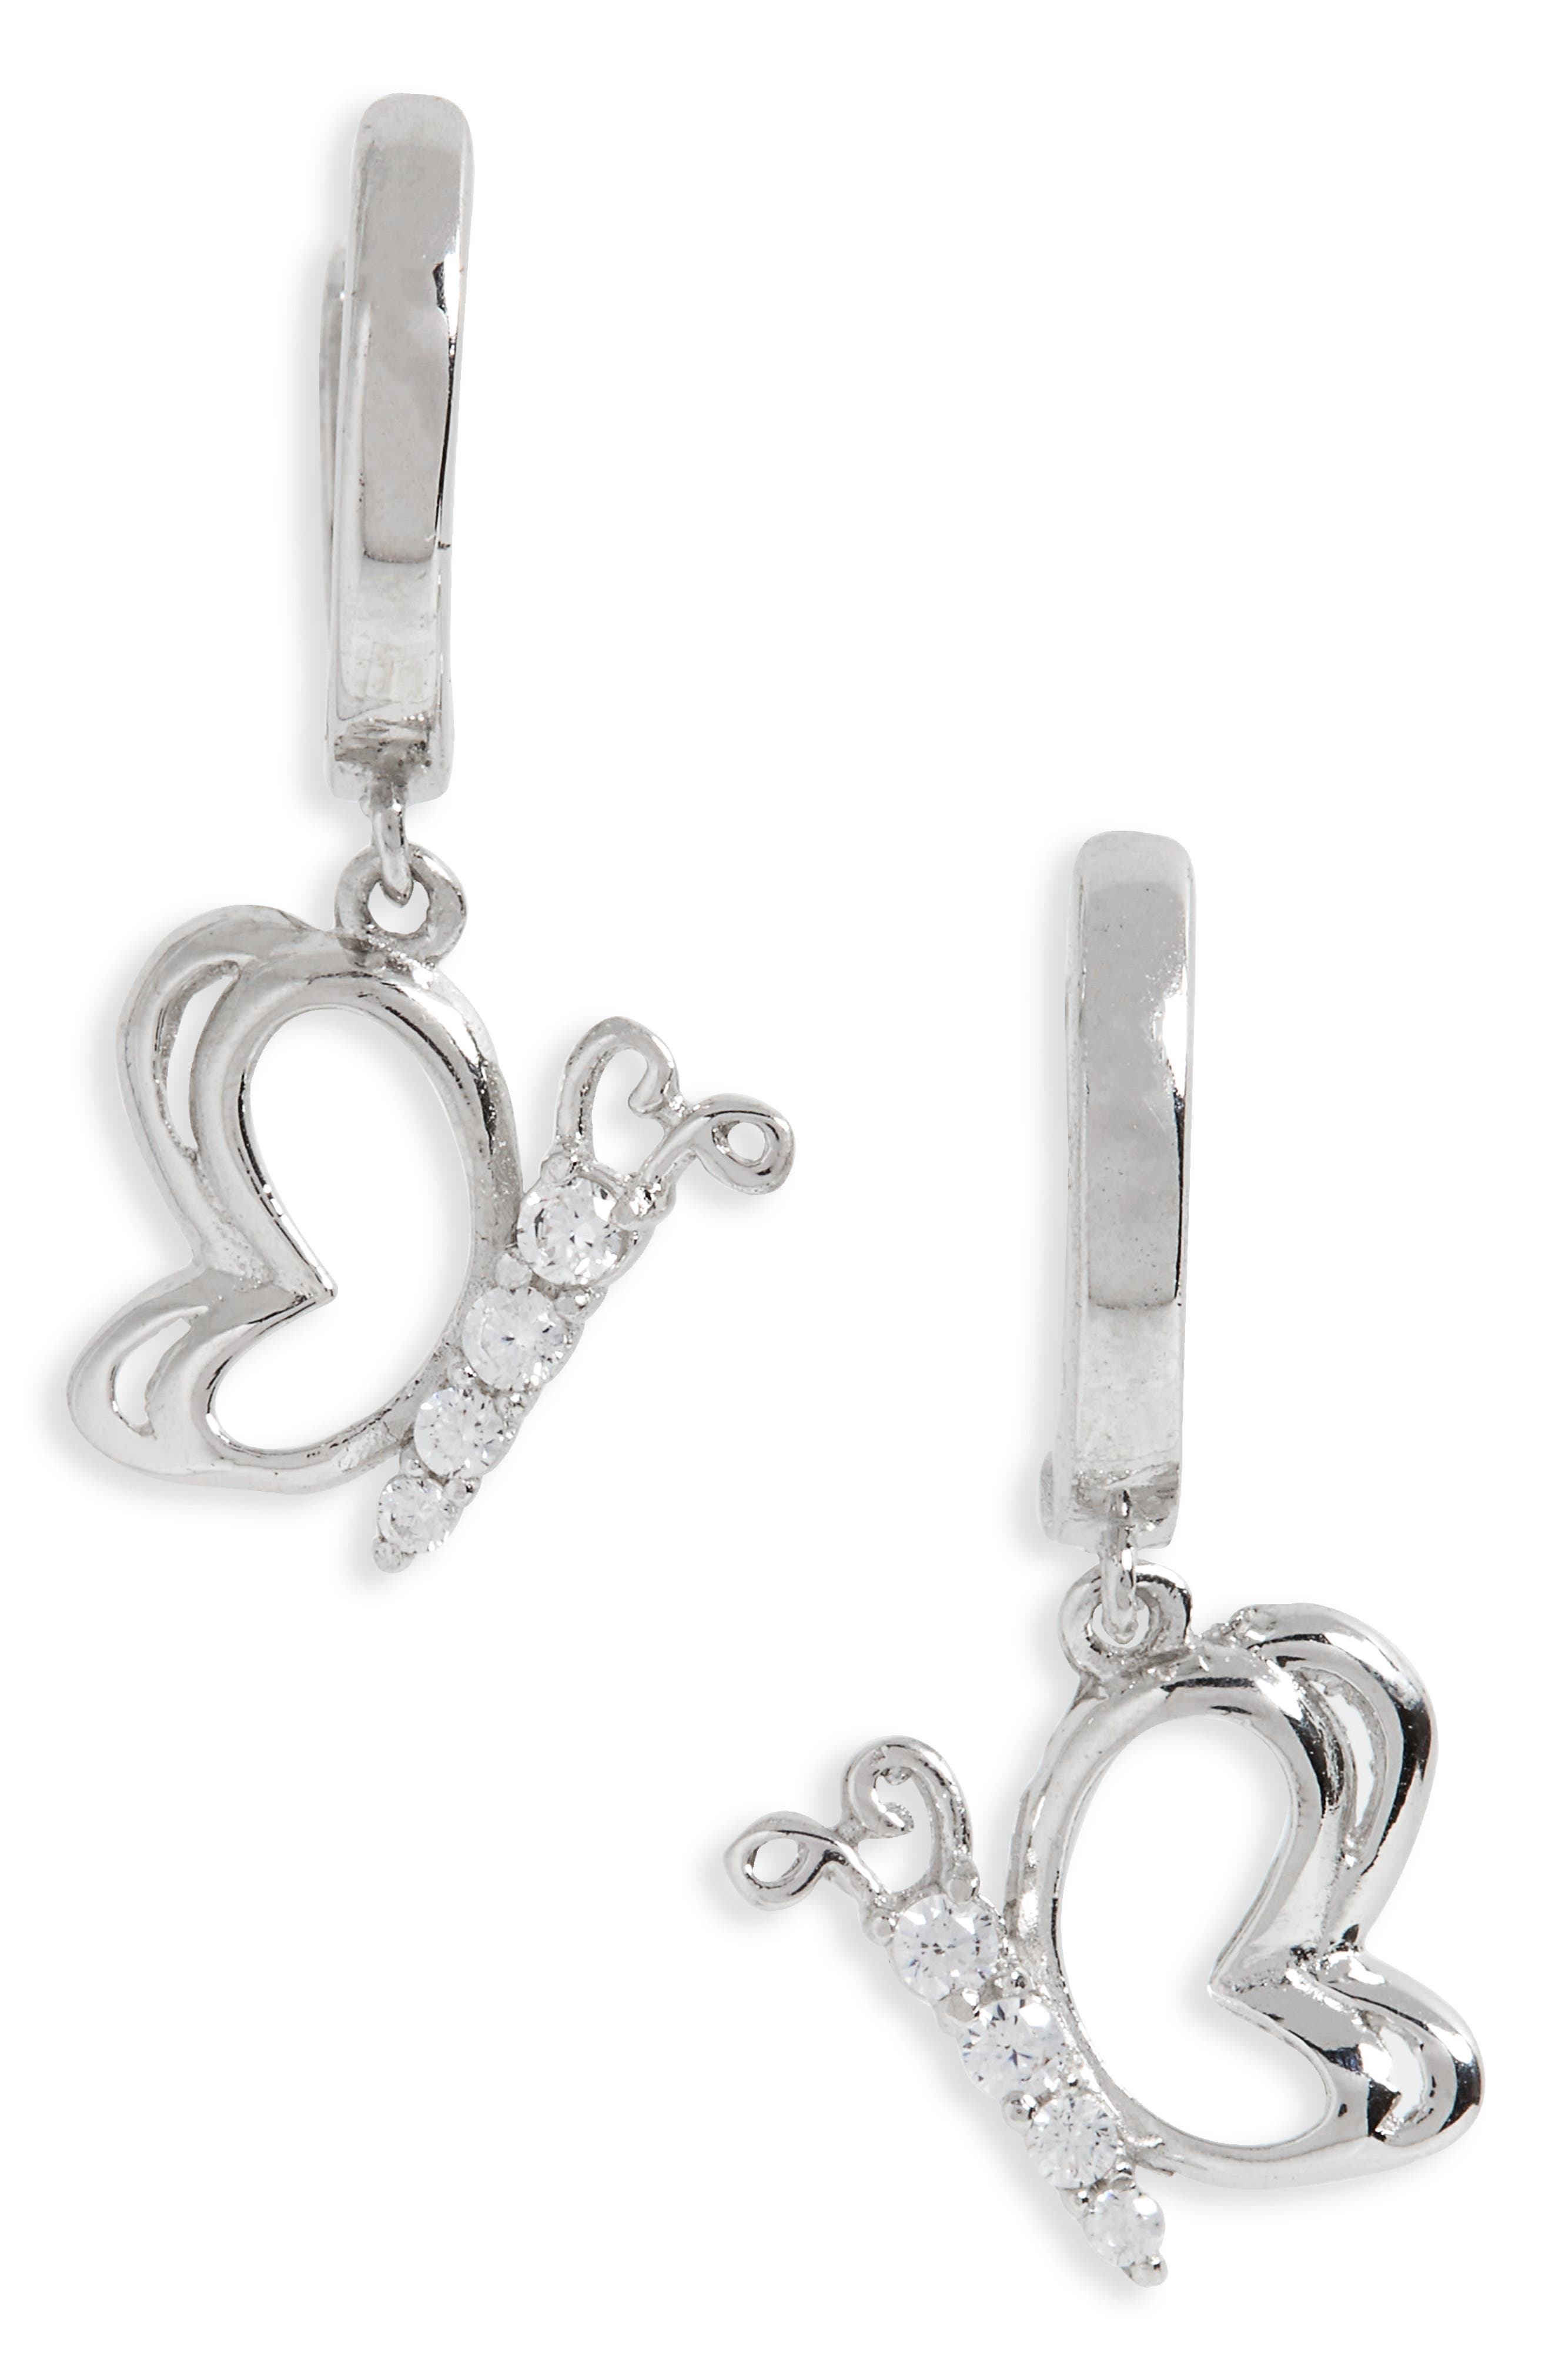 Kardee Kids Sterling Silver & Cubic Zirconia Butterfly Earrings,                             Main thumbnail 1, color,                             Silver